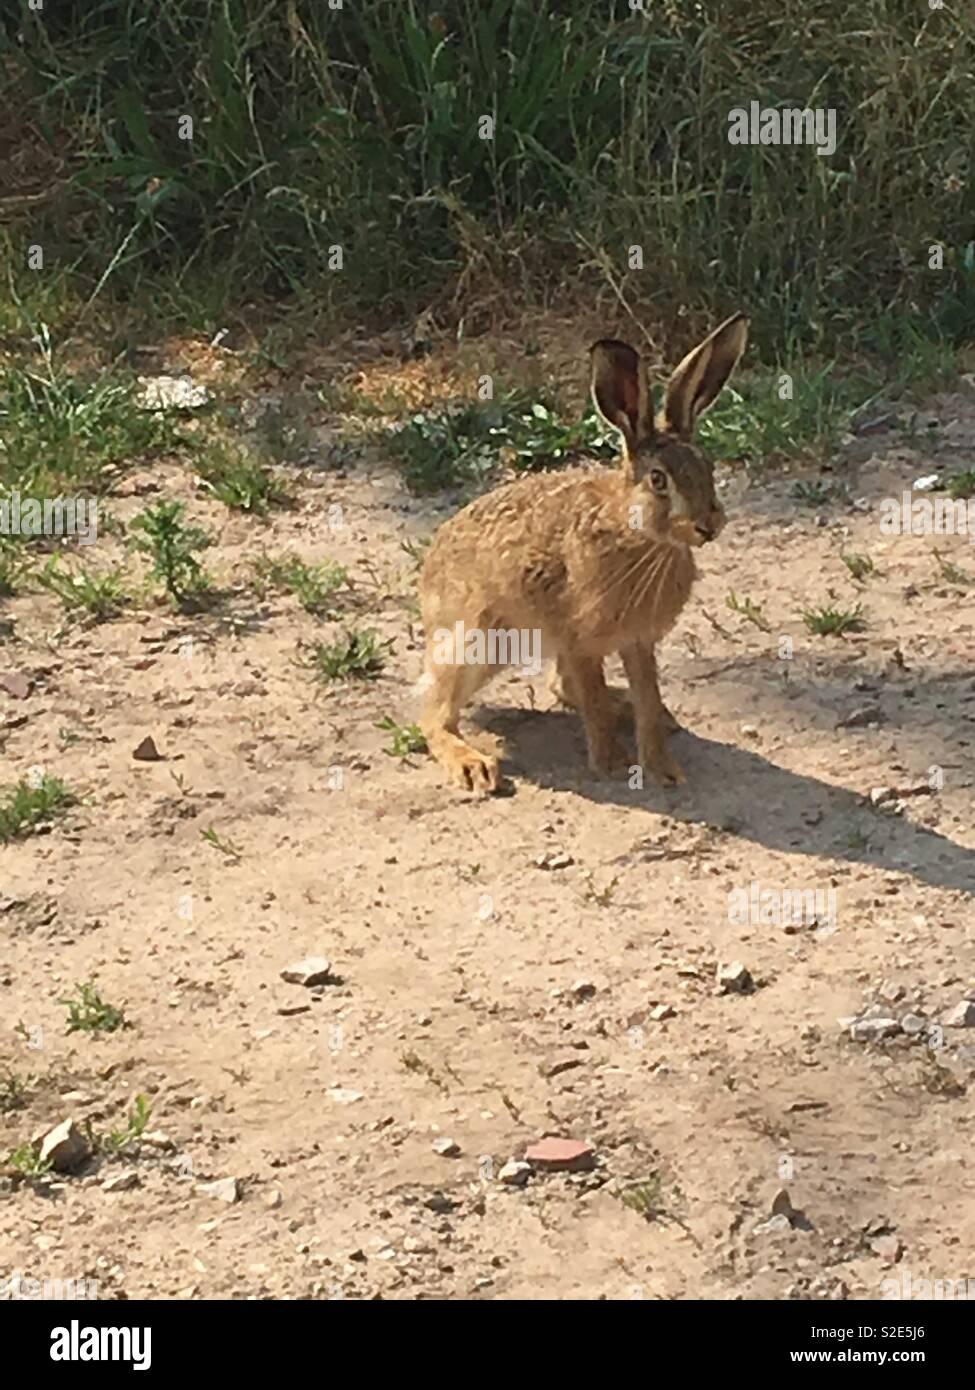 Hare in Sefton - Stock Image